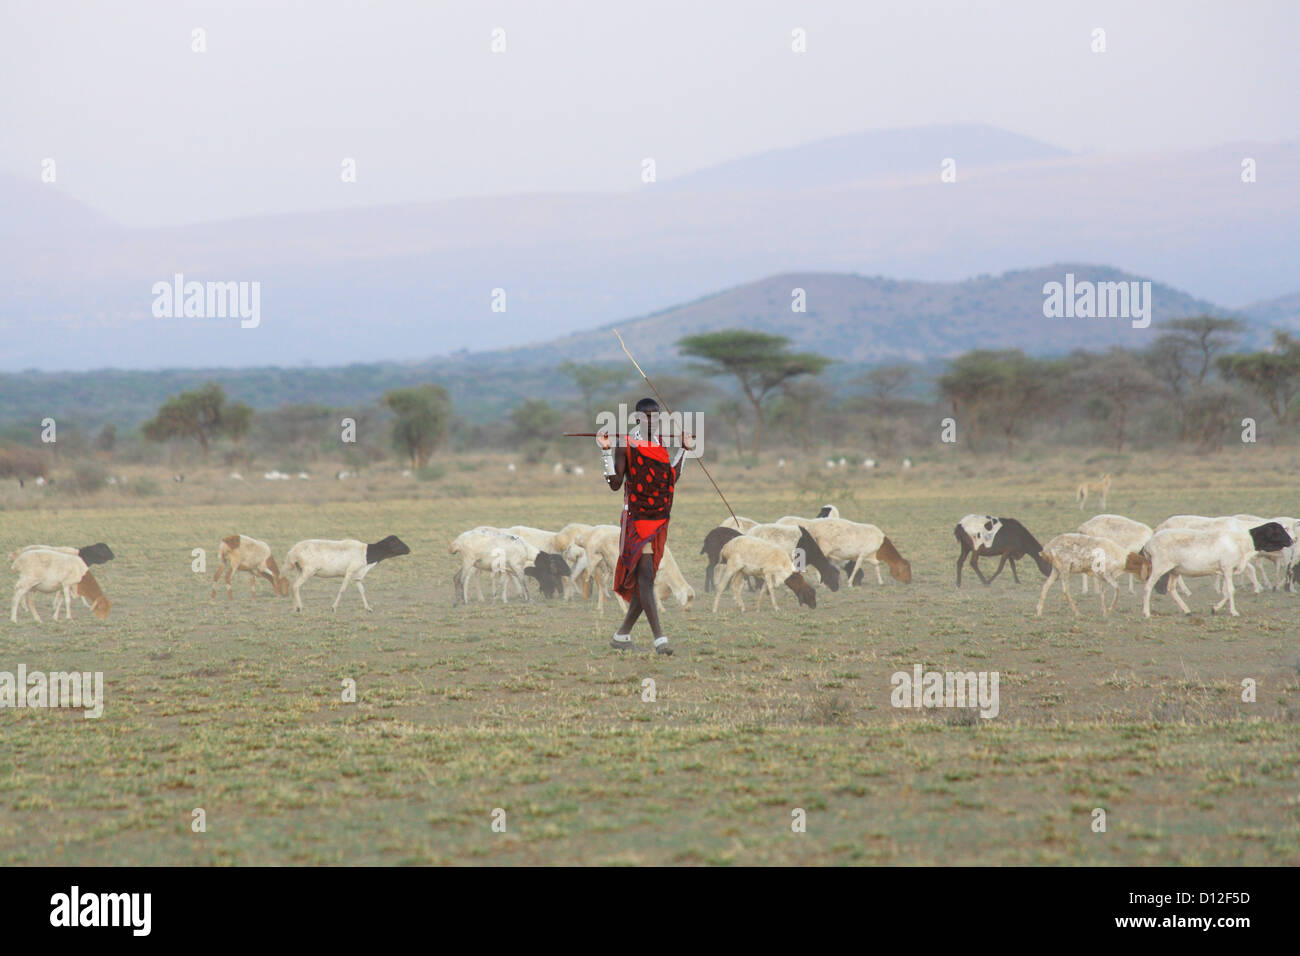 Masai shepherd with herd, Arusha region, Tanzania, Africa - Stock Image